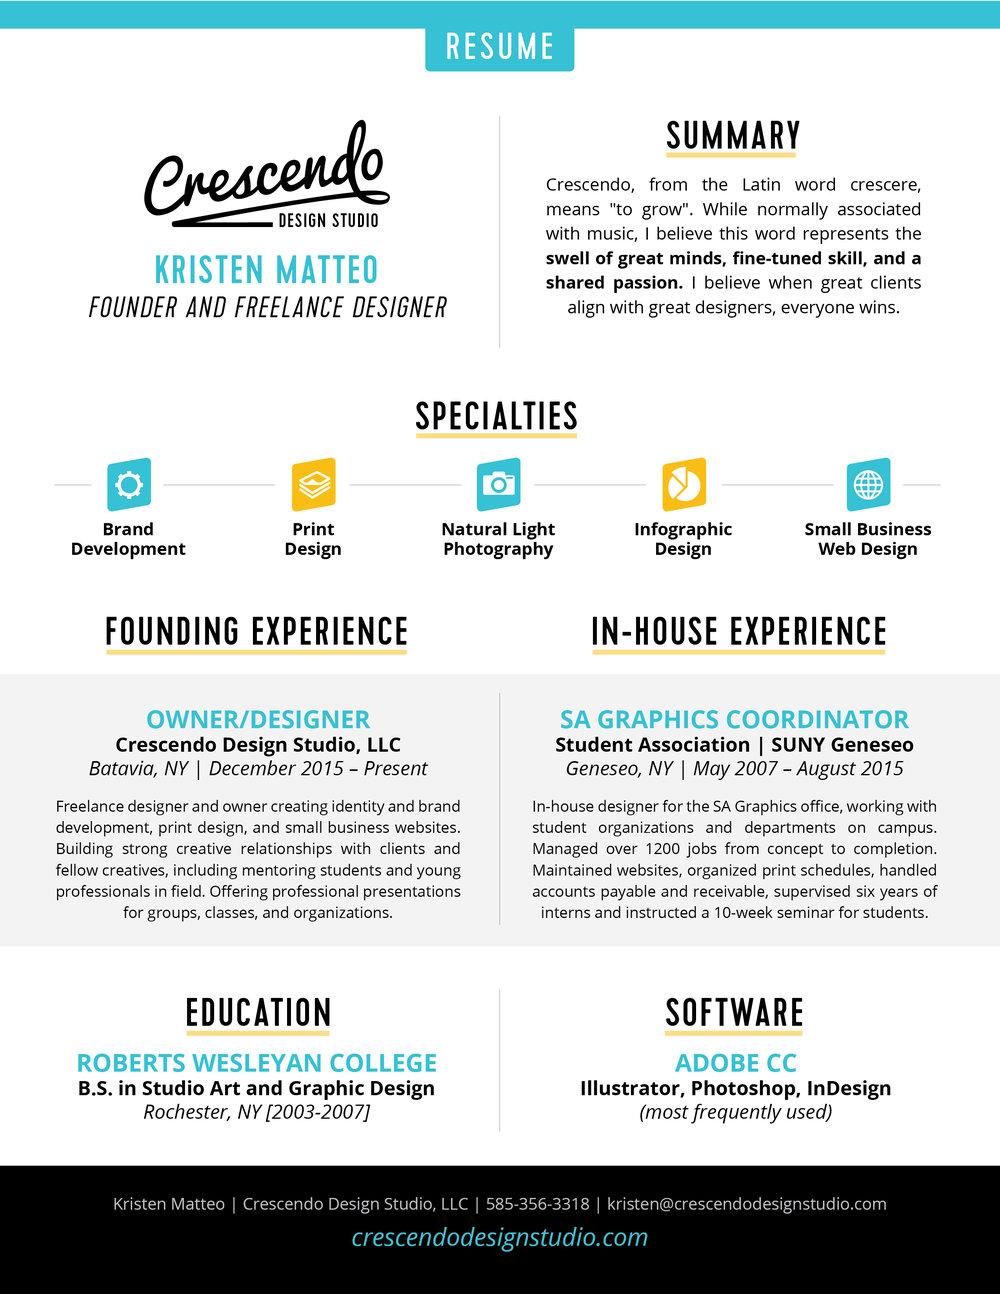 crescendo design studio resume